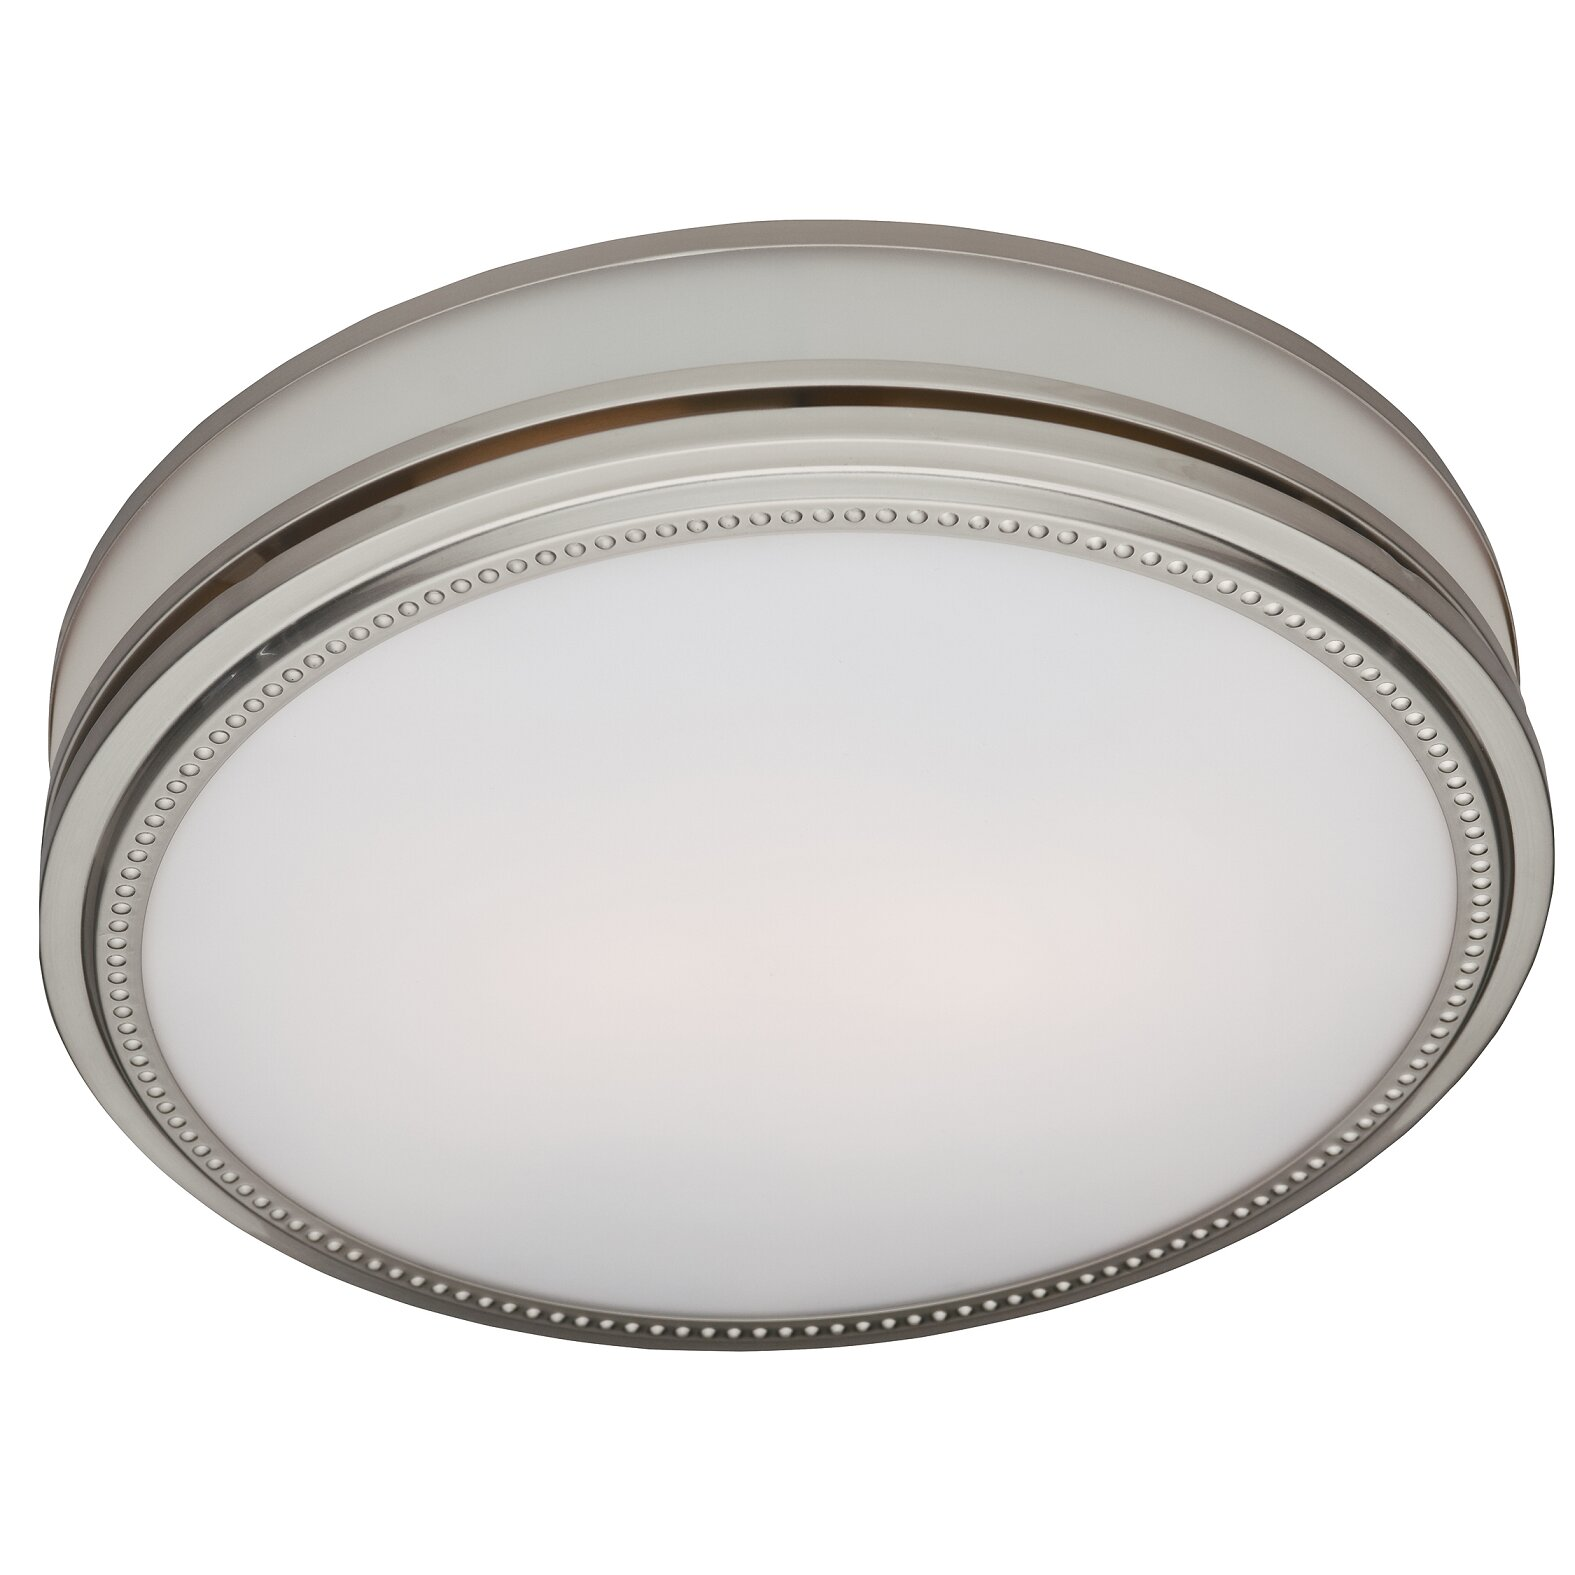 Quietest bathroom exhaust fan - Hunter Home Comfort Riazzi 110 Cfm Bathroom Fan With Light